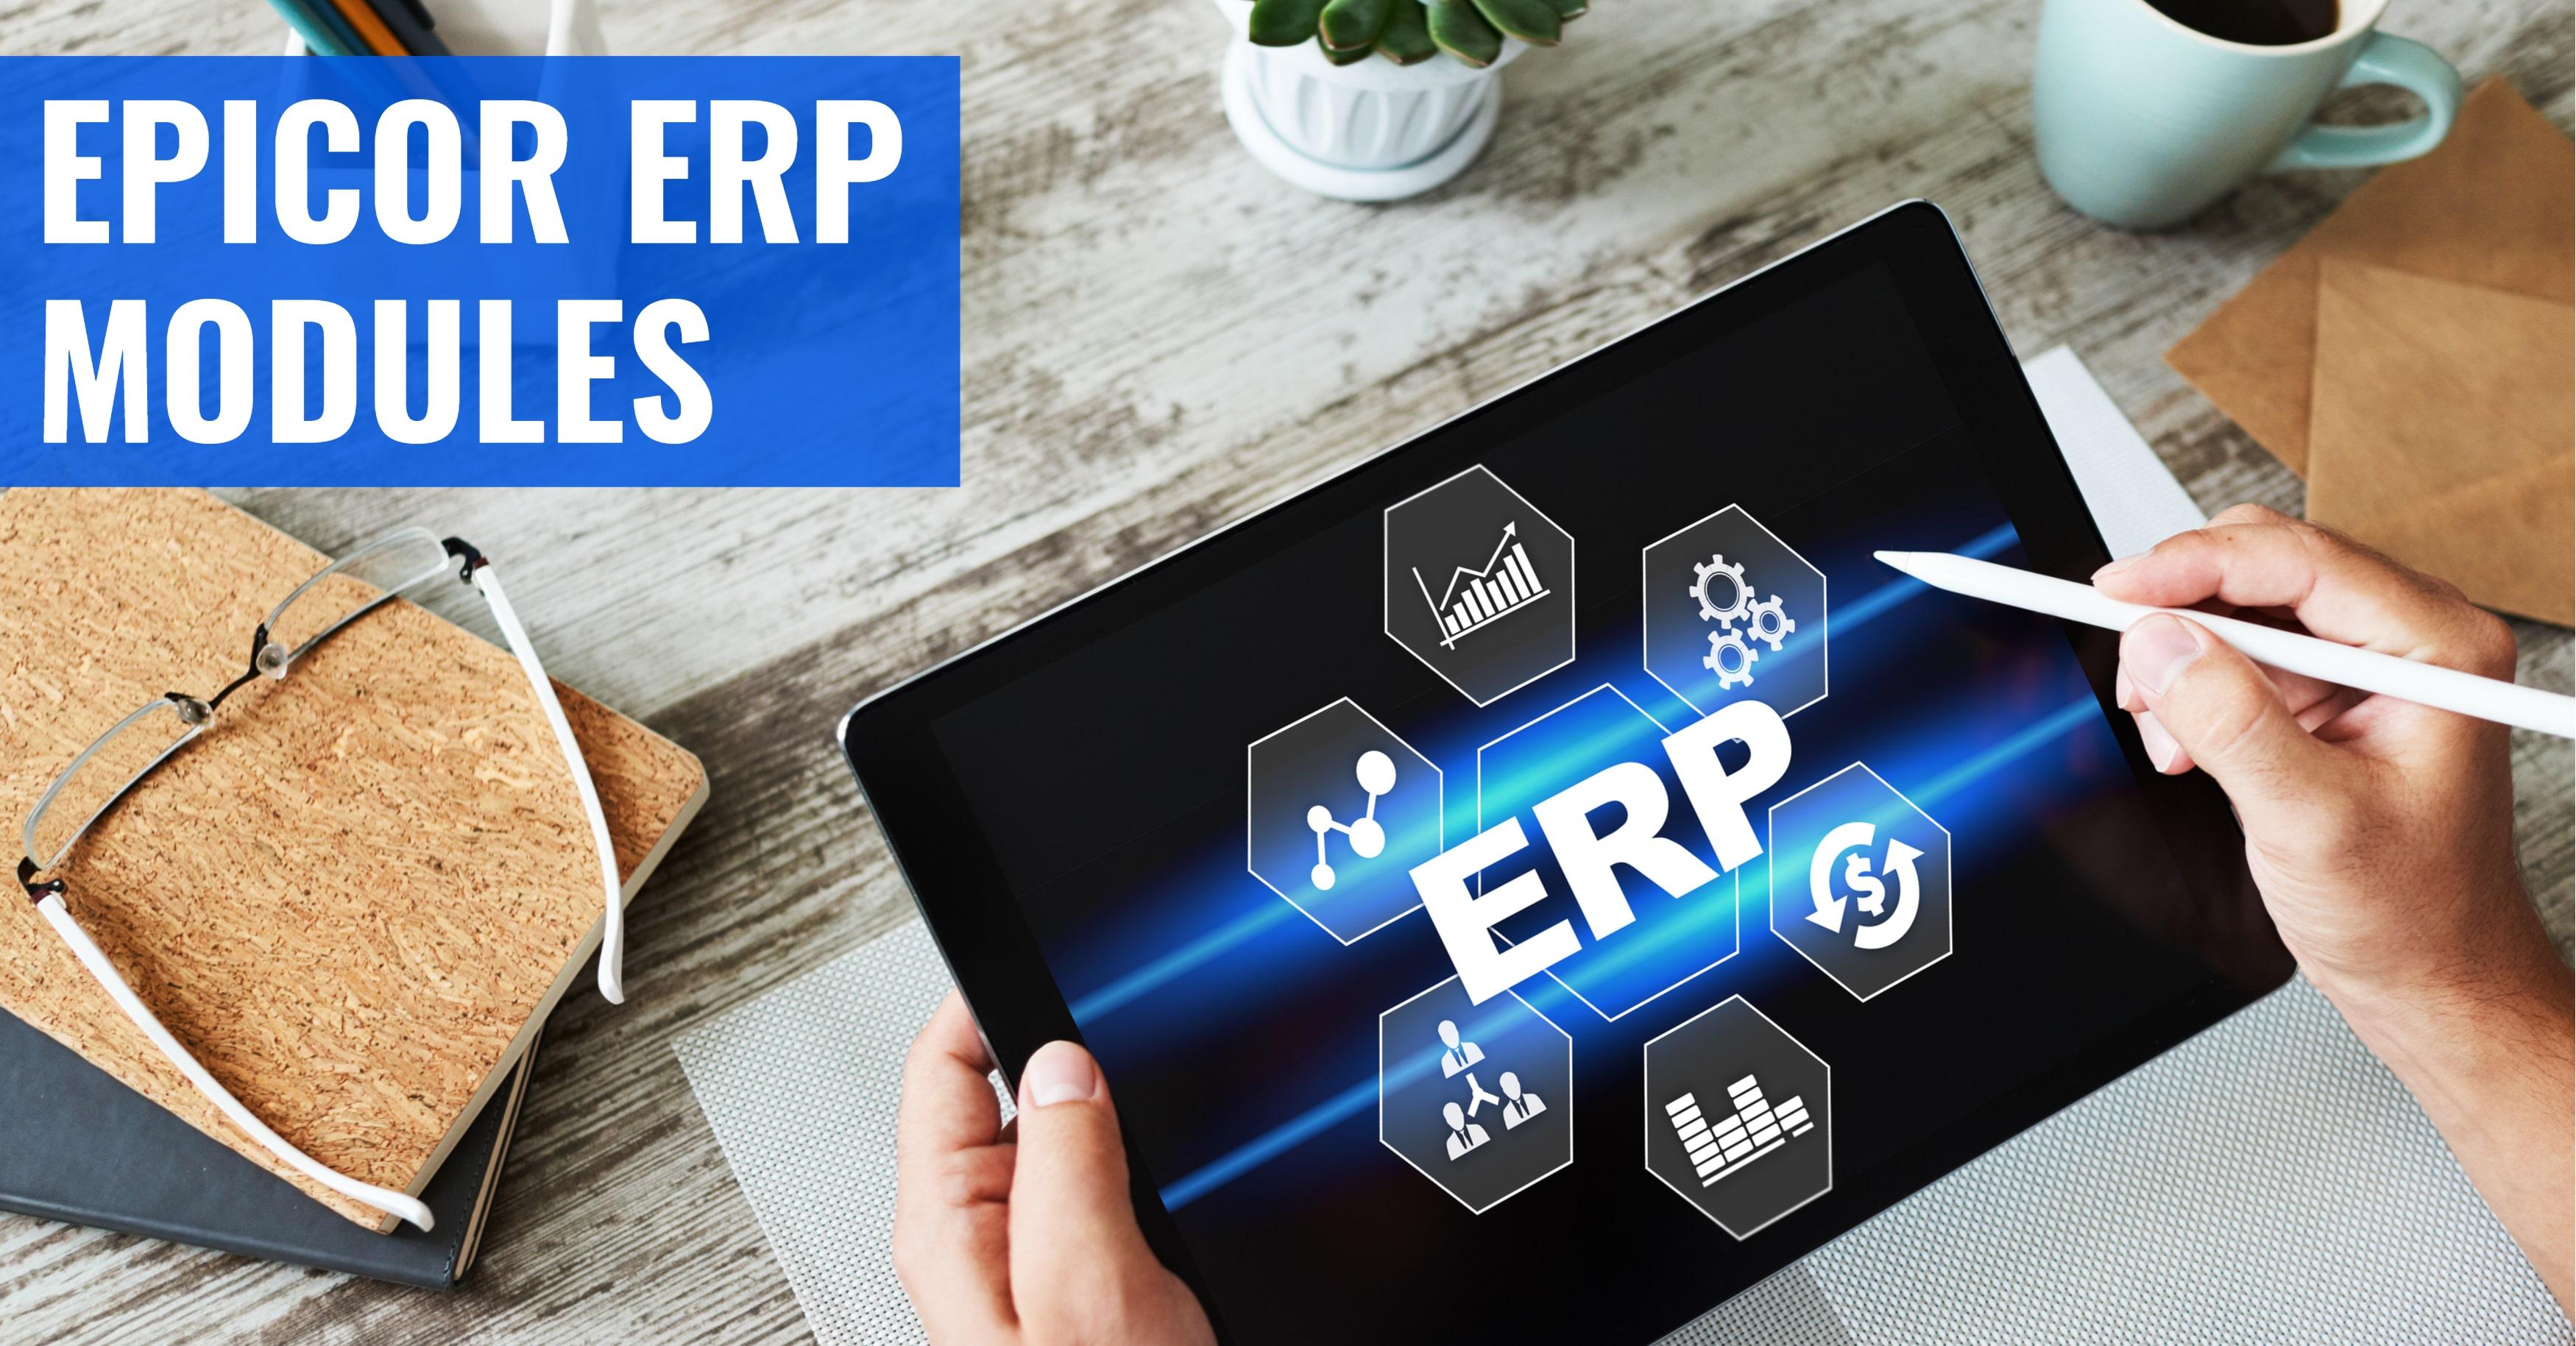 Epicor ERP Modules Overview